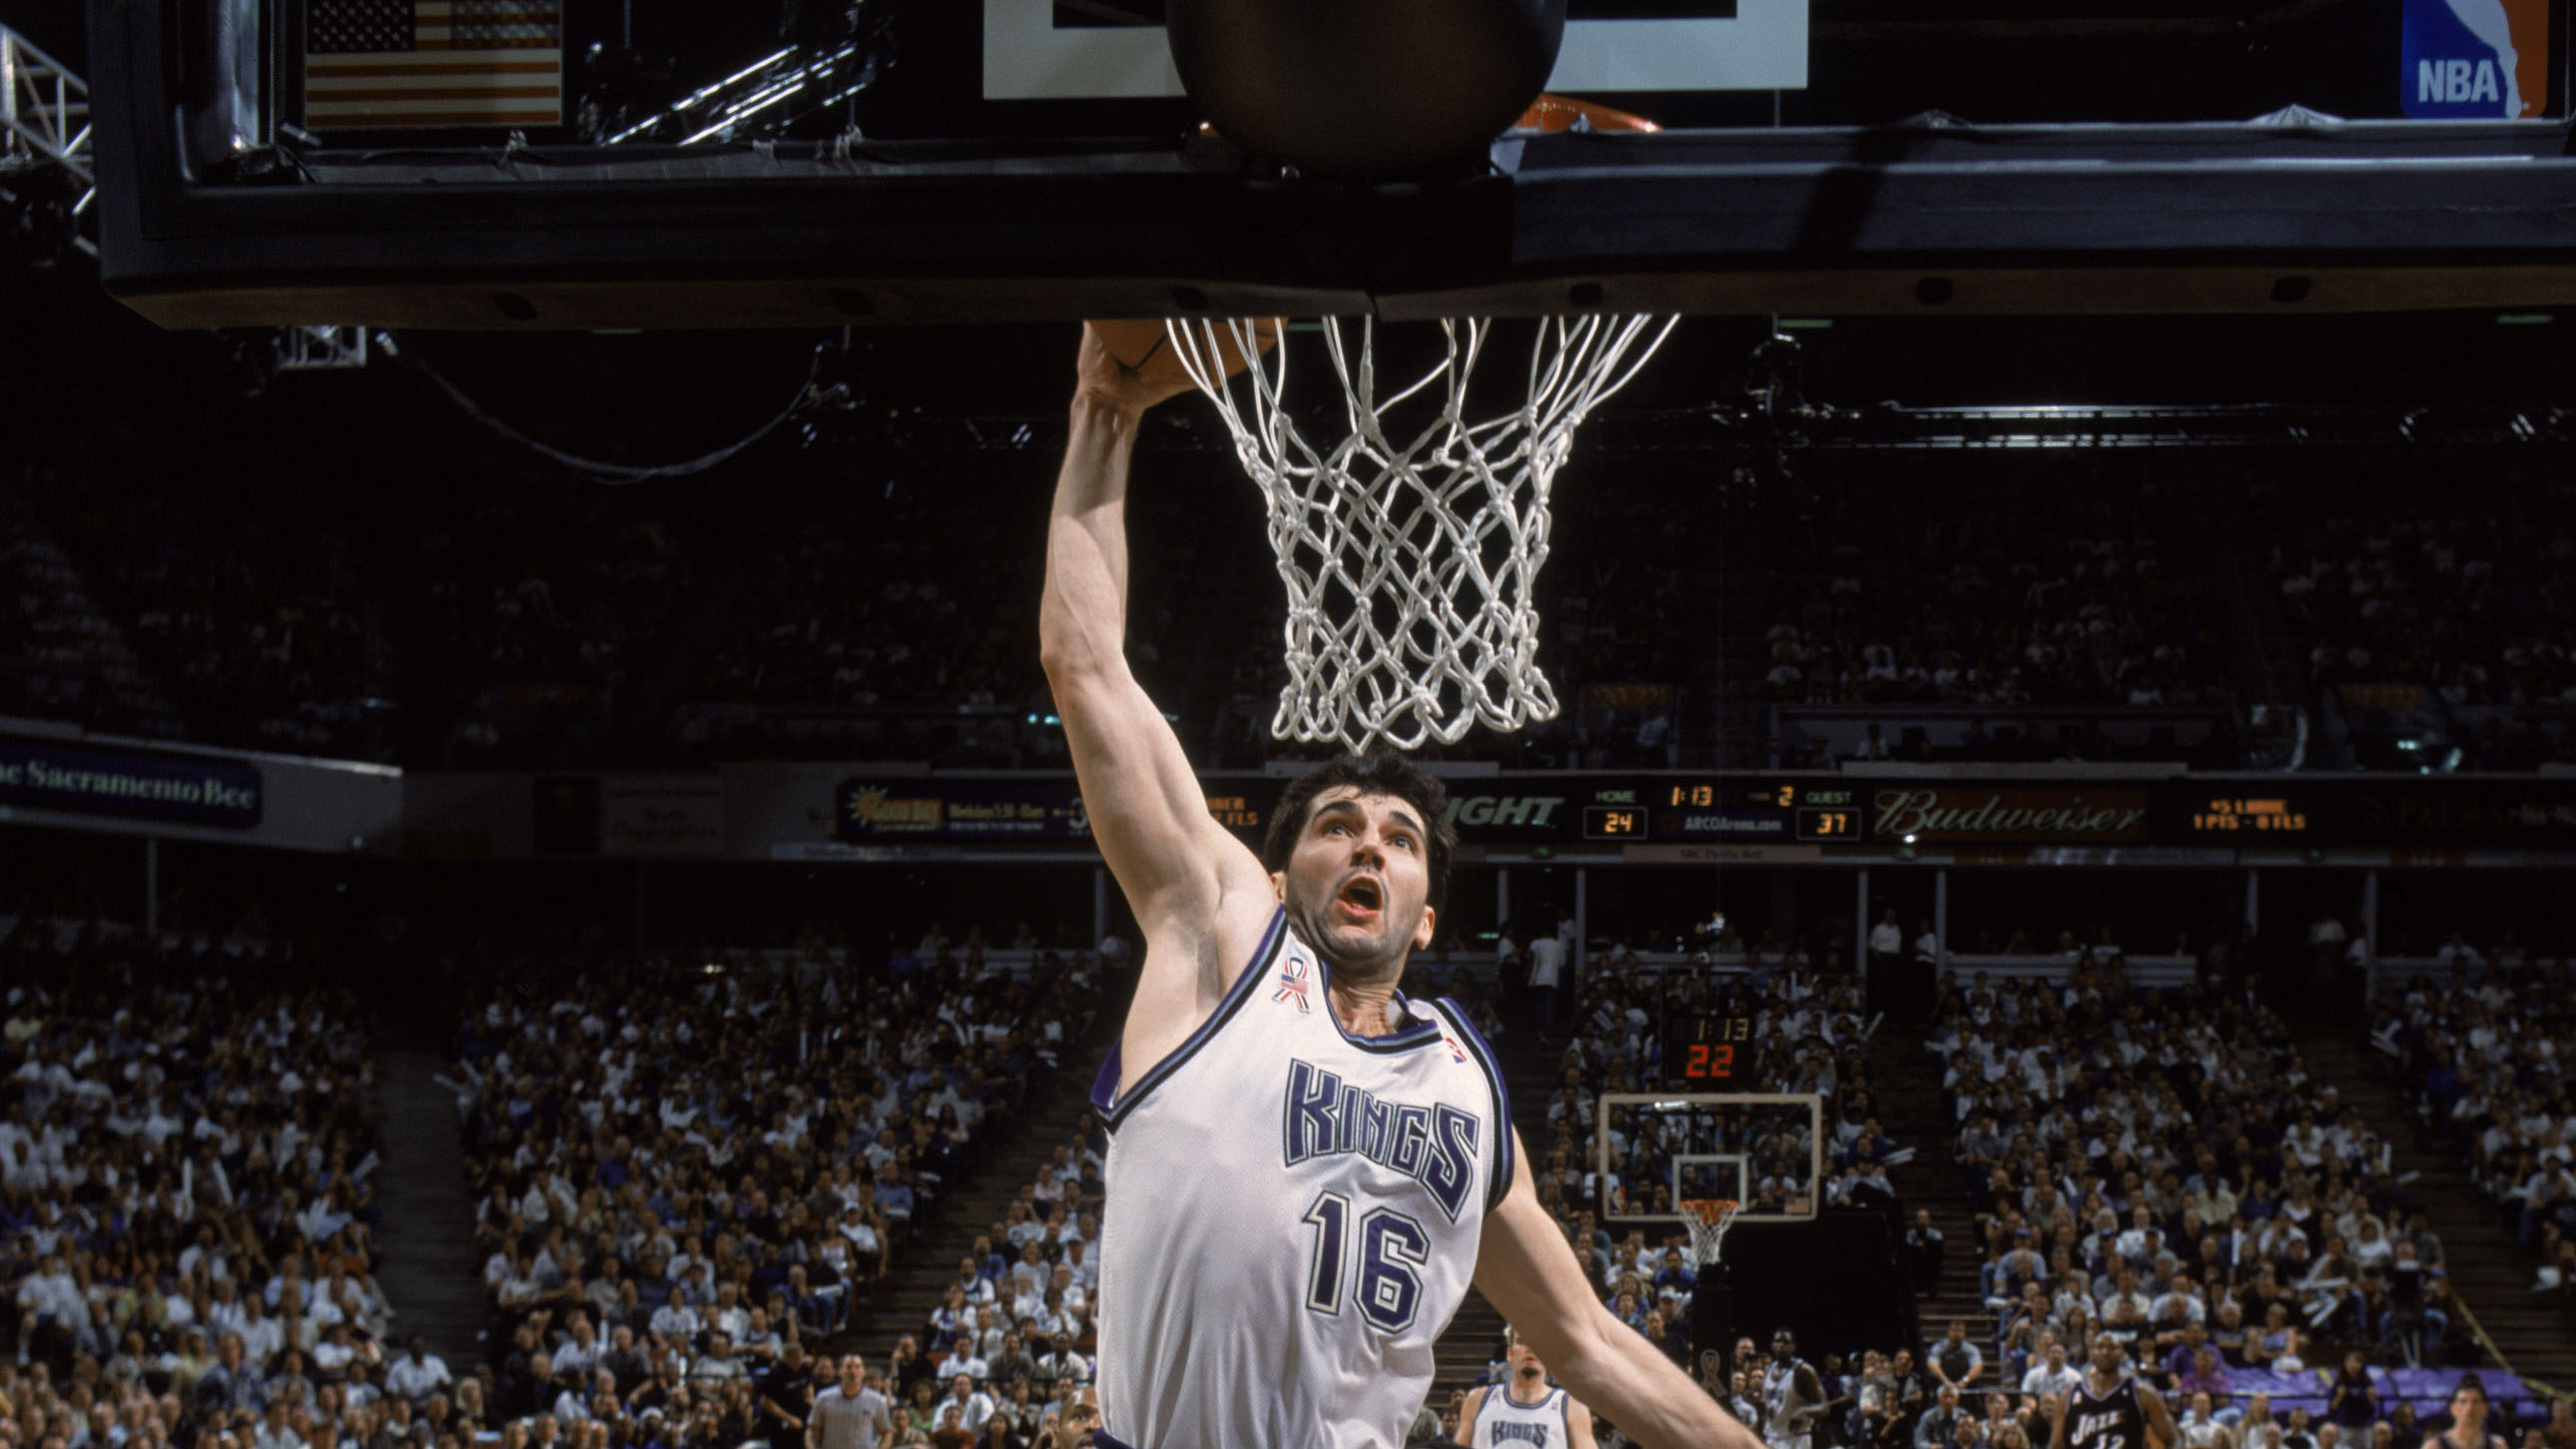 Sacramento Kings will retire Peja Stojakovic s jersey on Dec 16